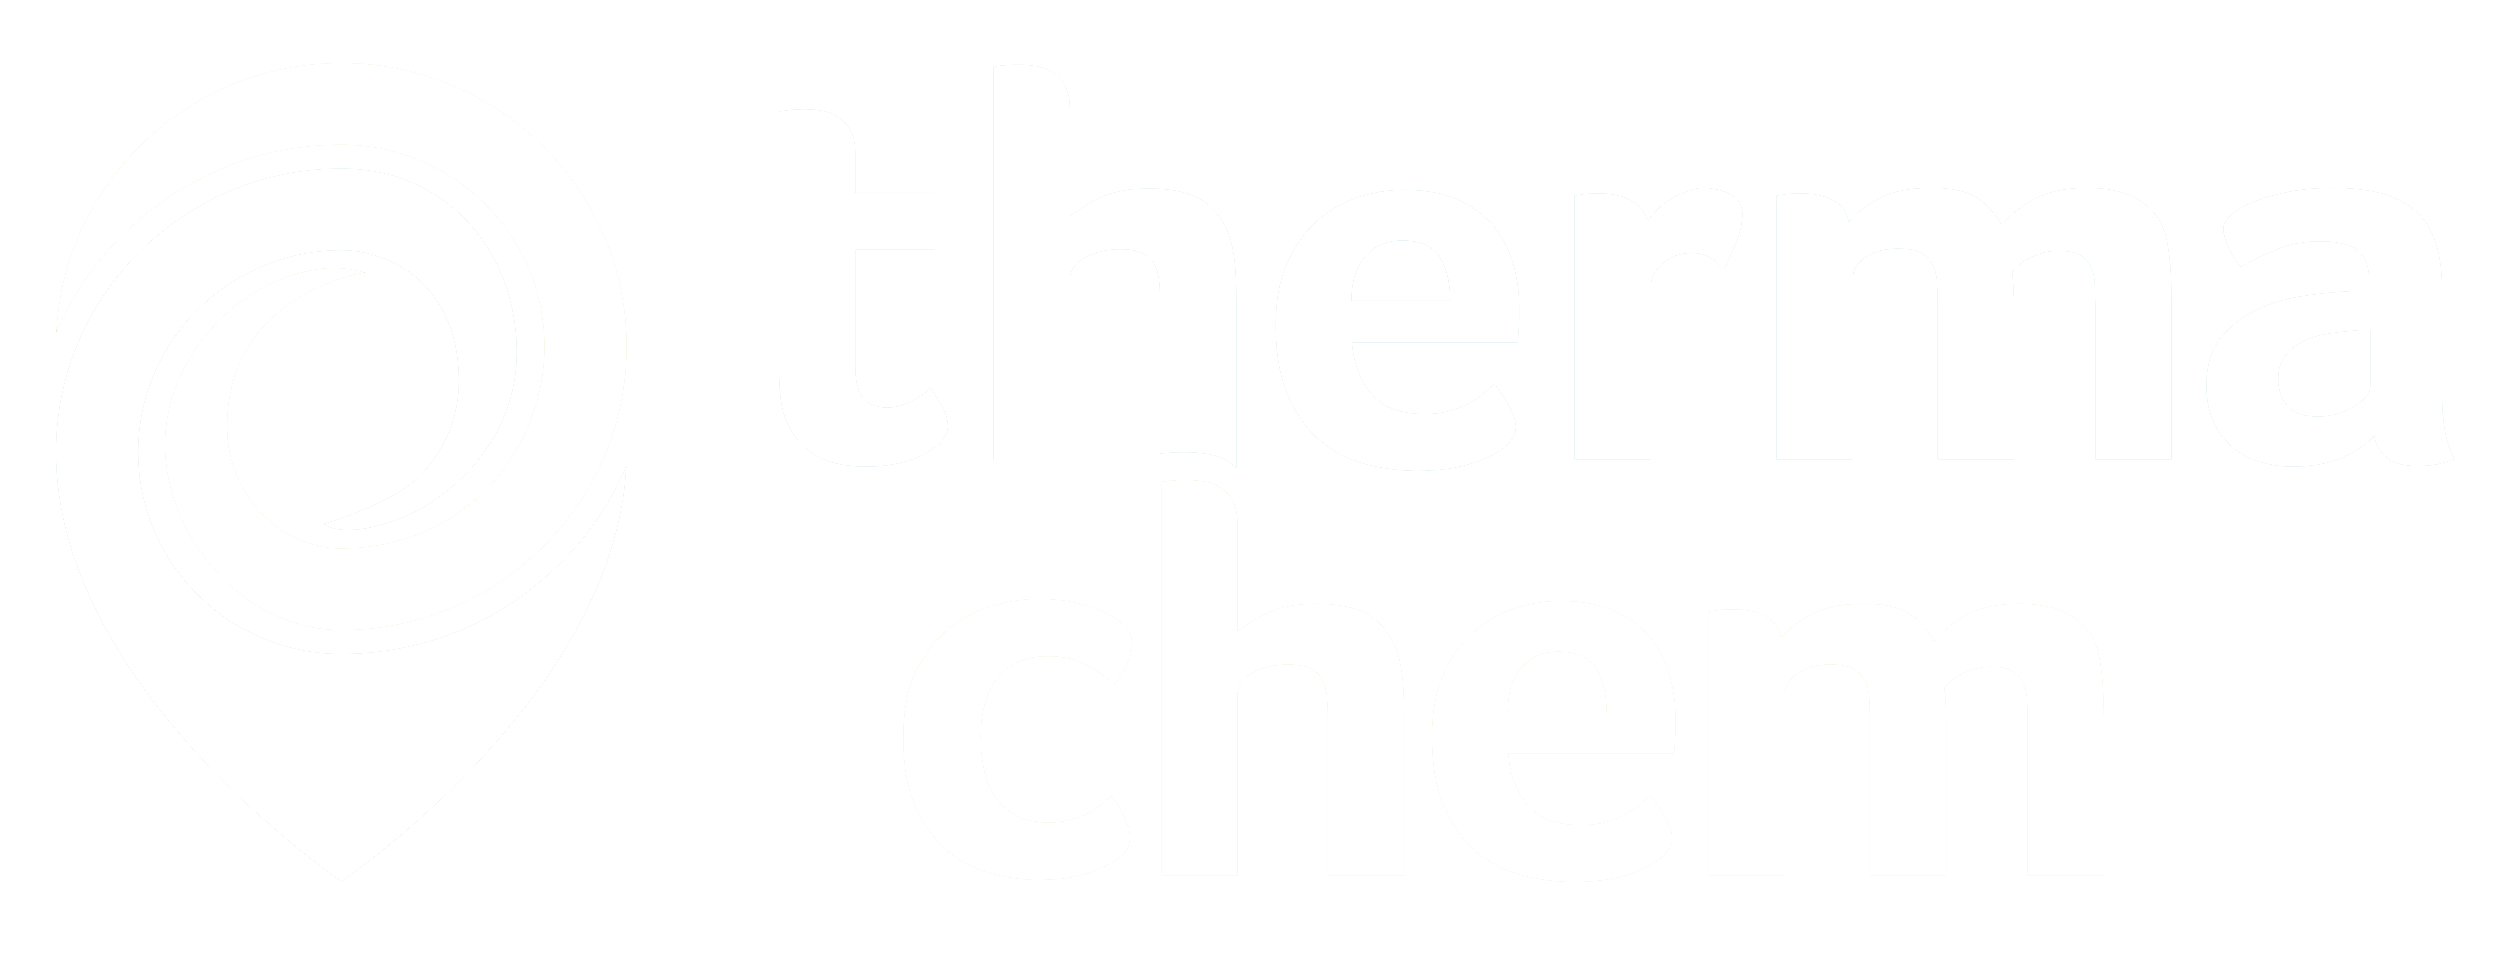 Therma Chem Ltd logo